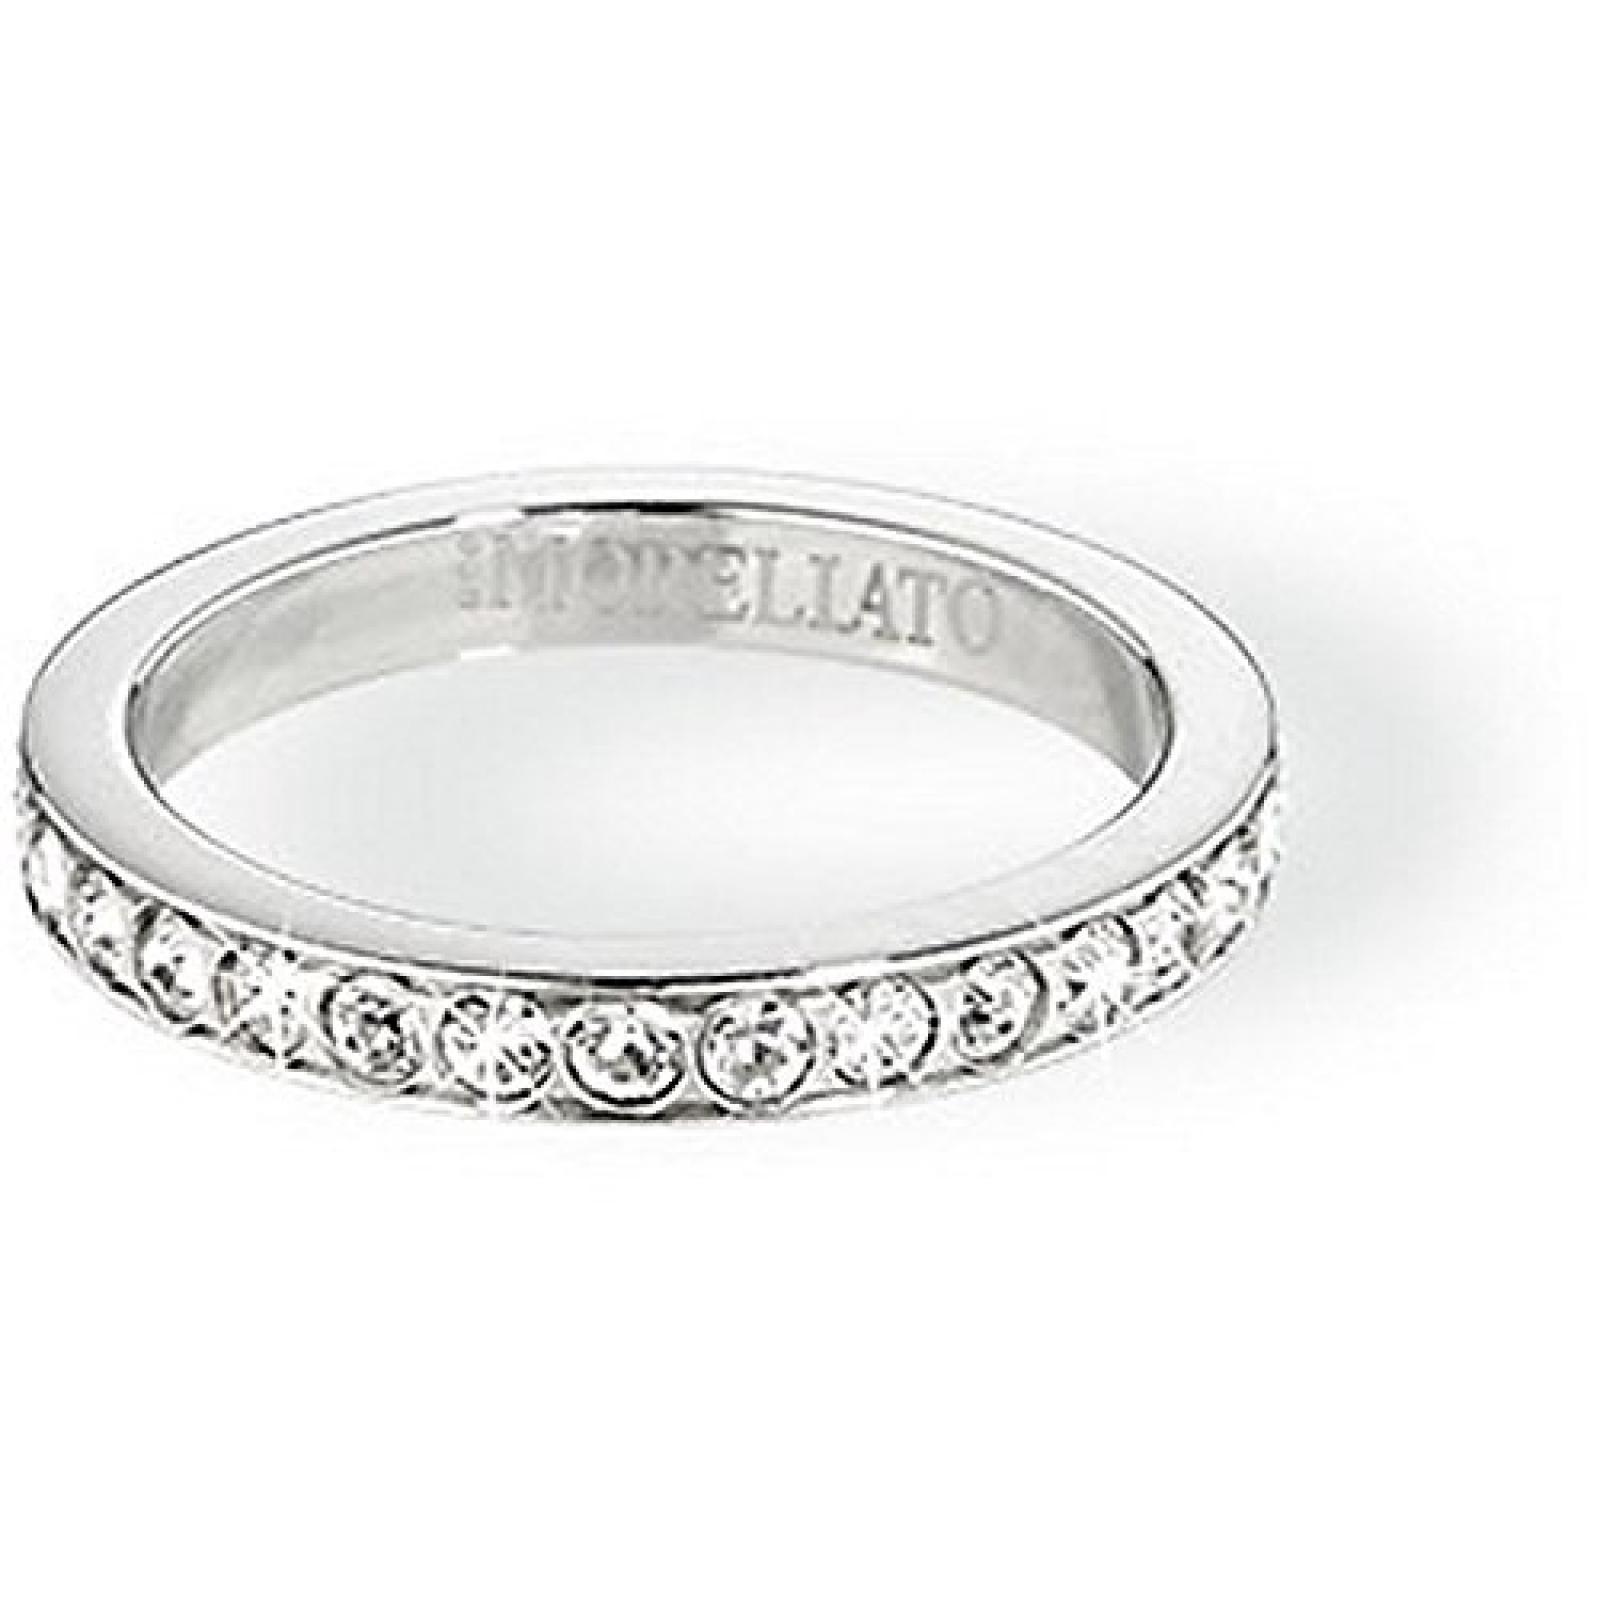 Morellato Damen-Ring Edelstahl silber Gr. SNA26012